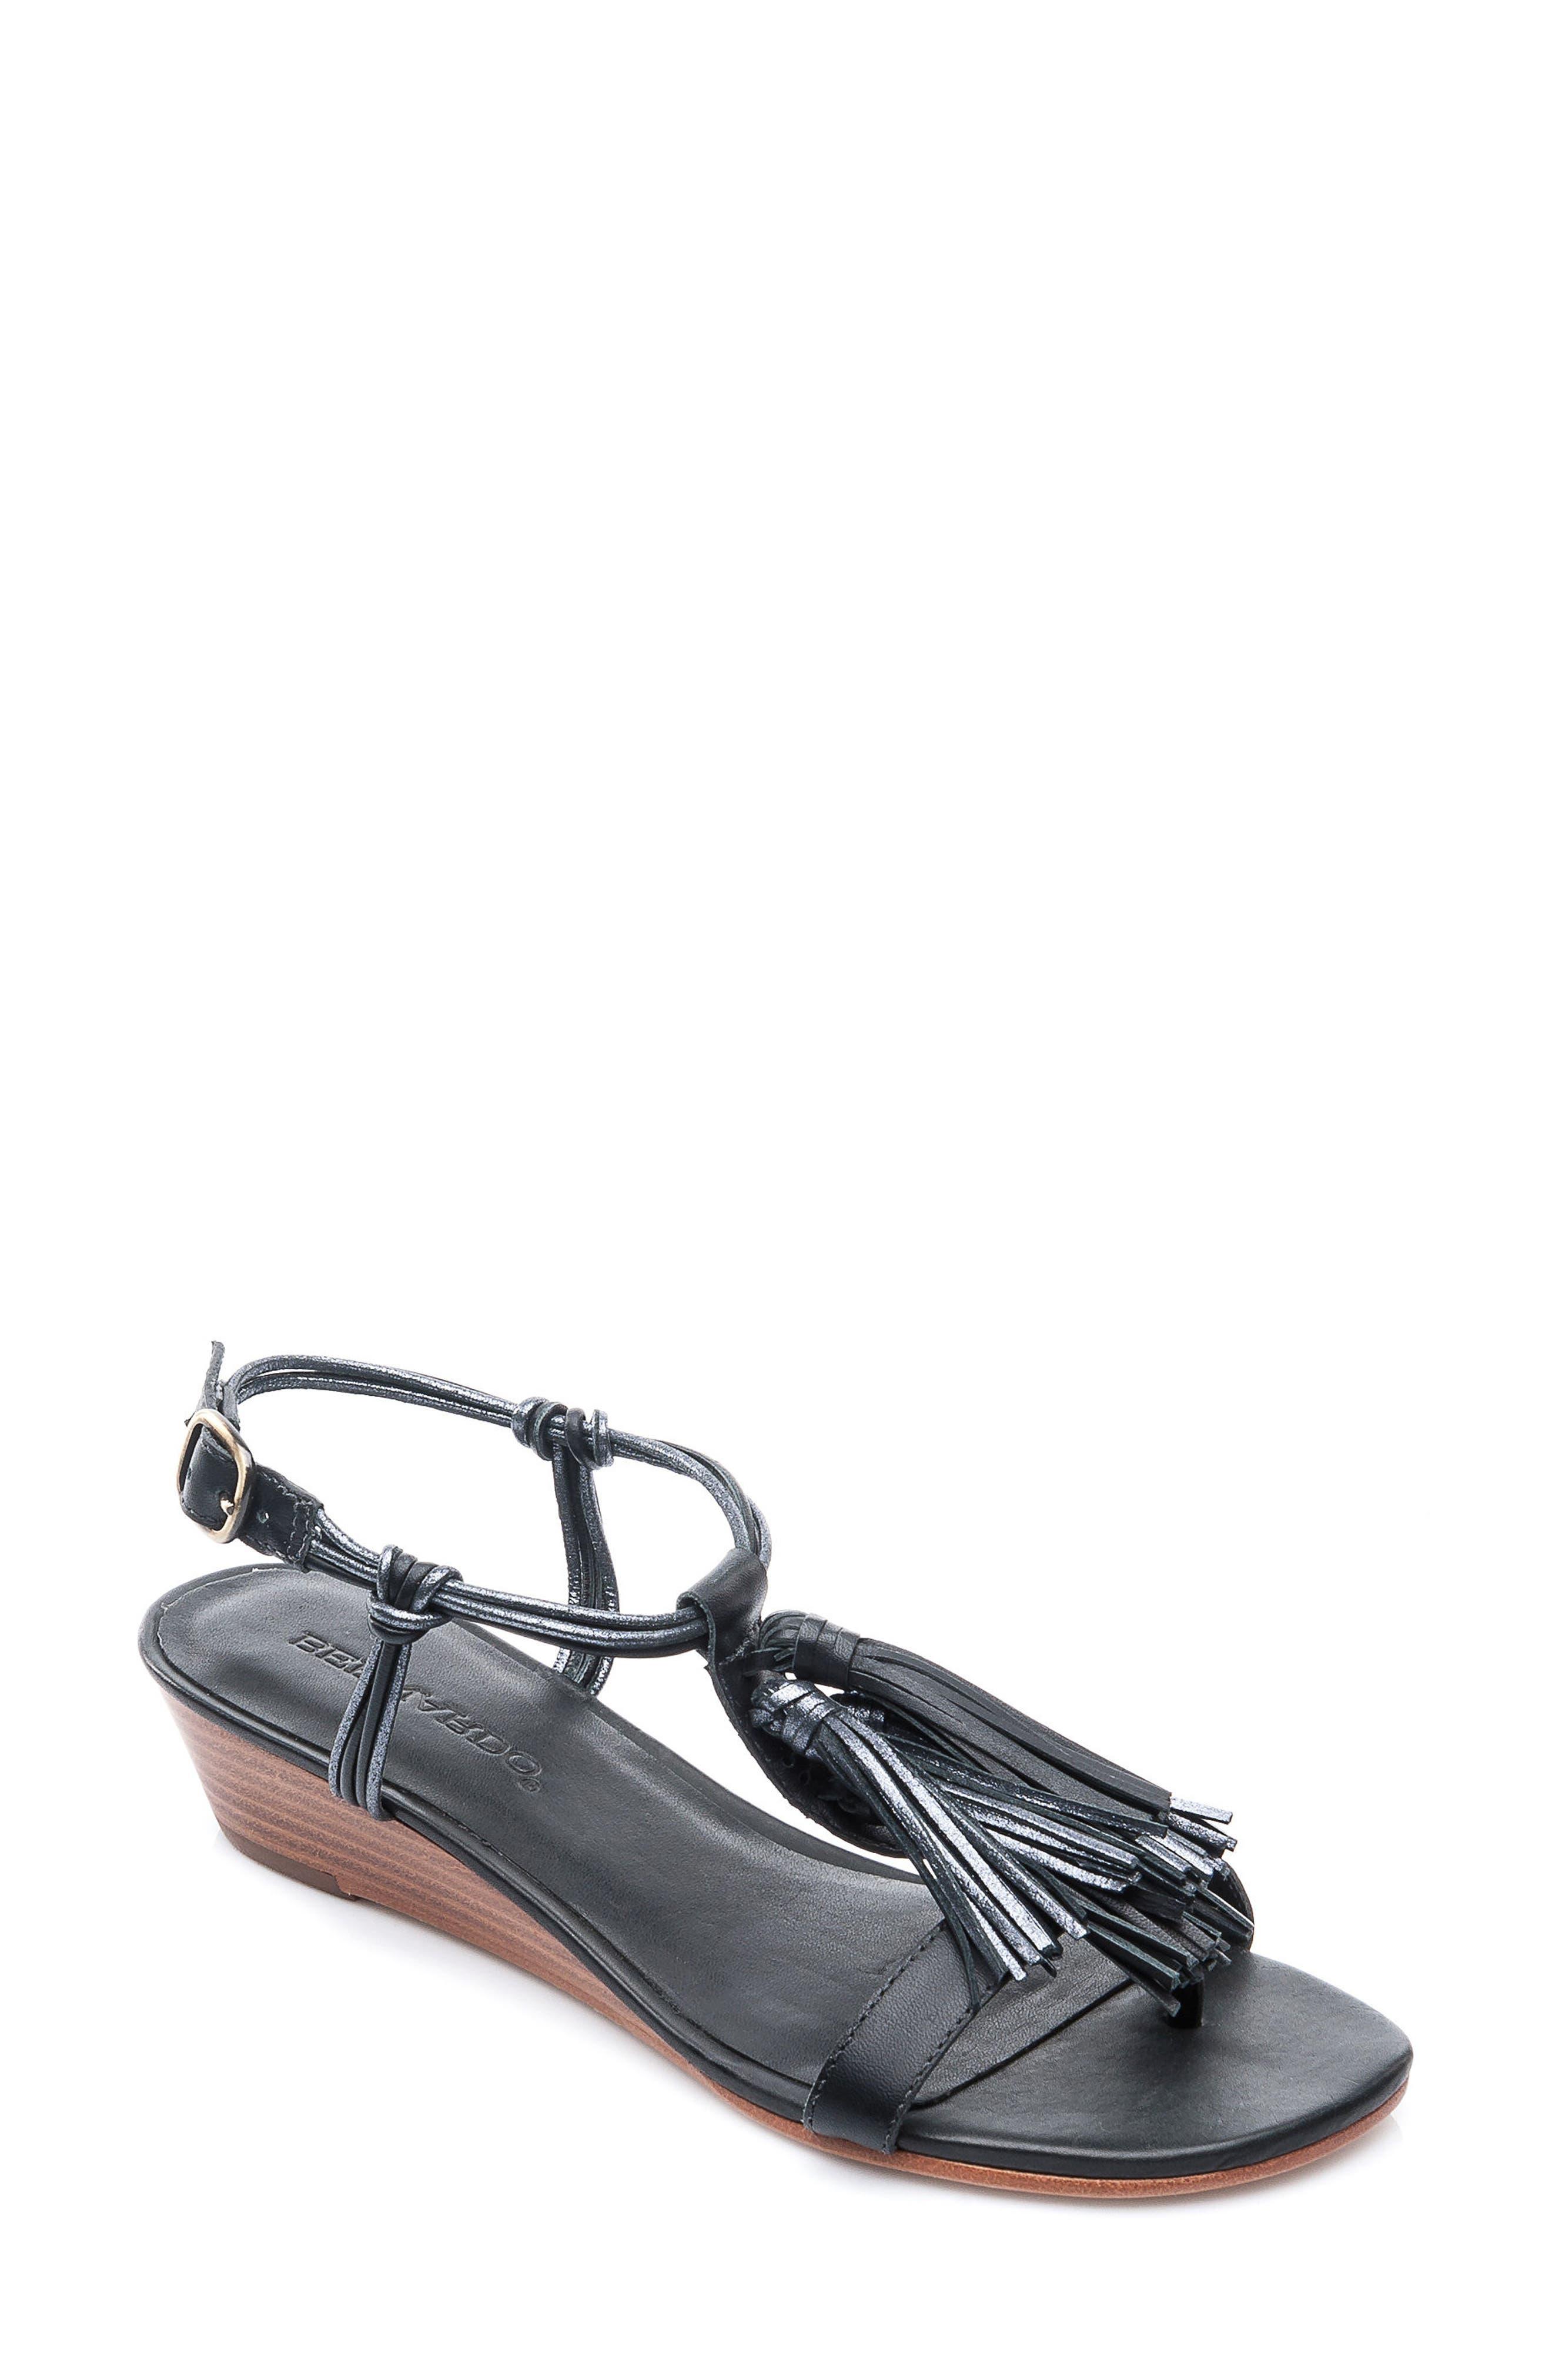 Footwear Court Fringe Leather Sandal,                             Main thumbnail 1, color,